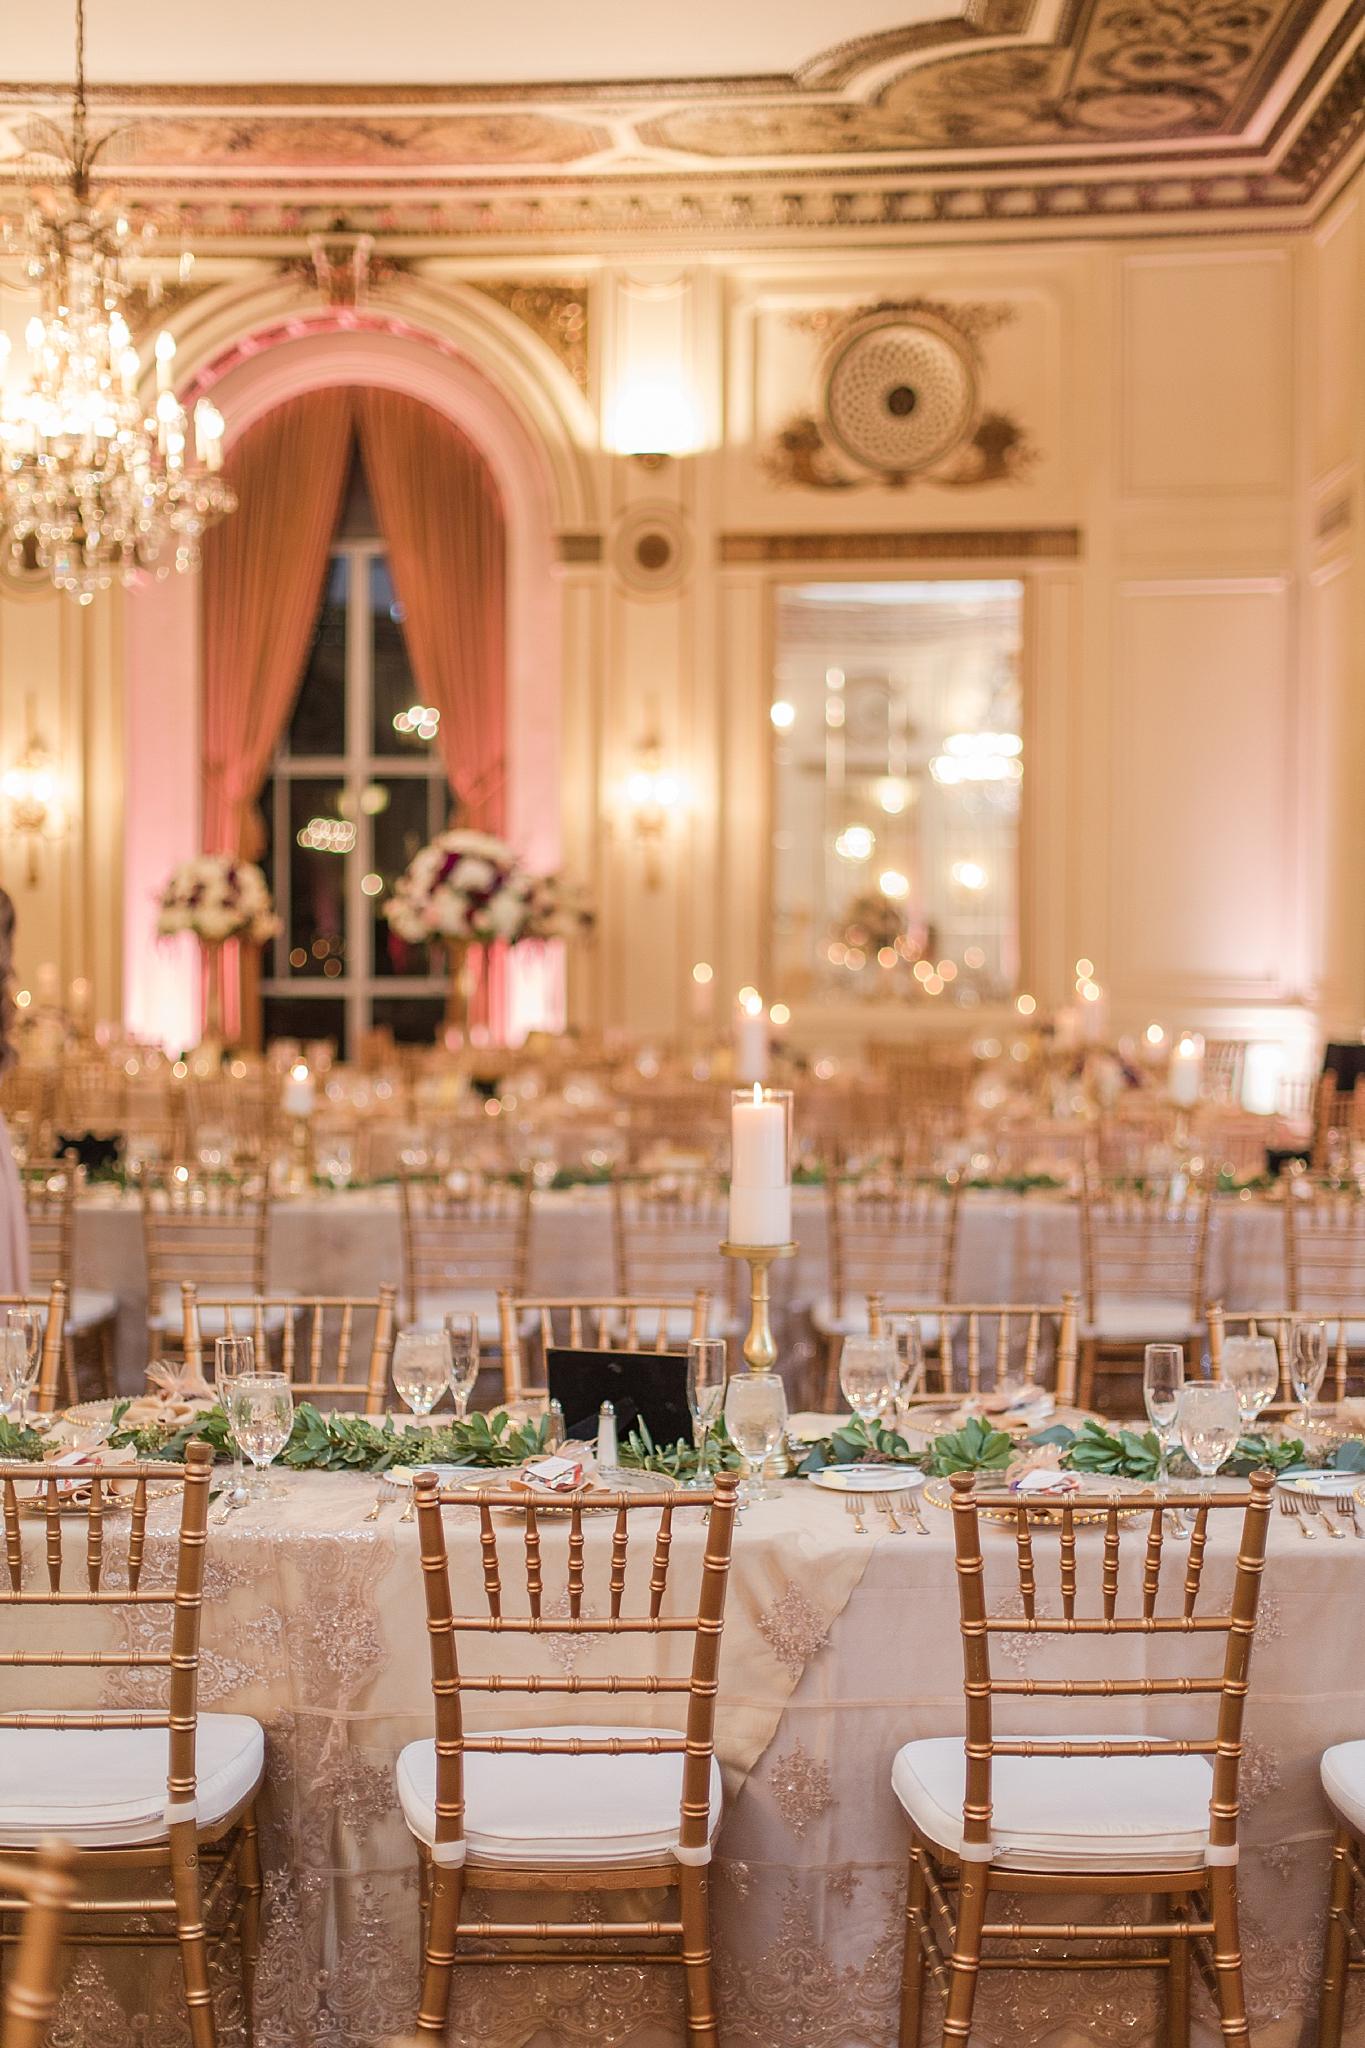 detroit-colony-club-wedding-regal-romantic-photography-in-detroit-mi-by-courtney-carolyn-photography_0041.jpg